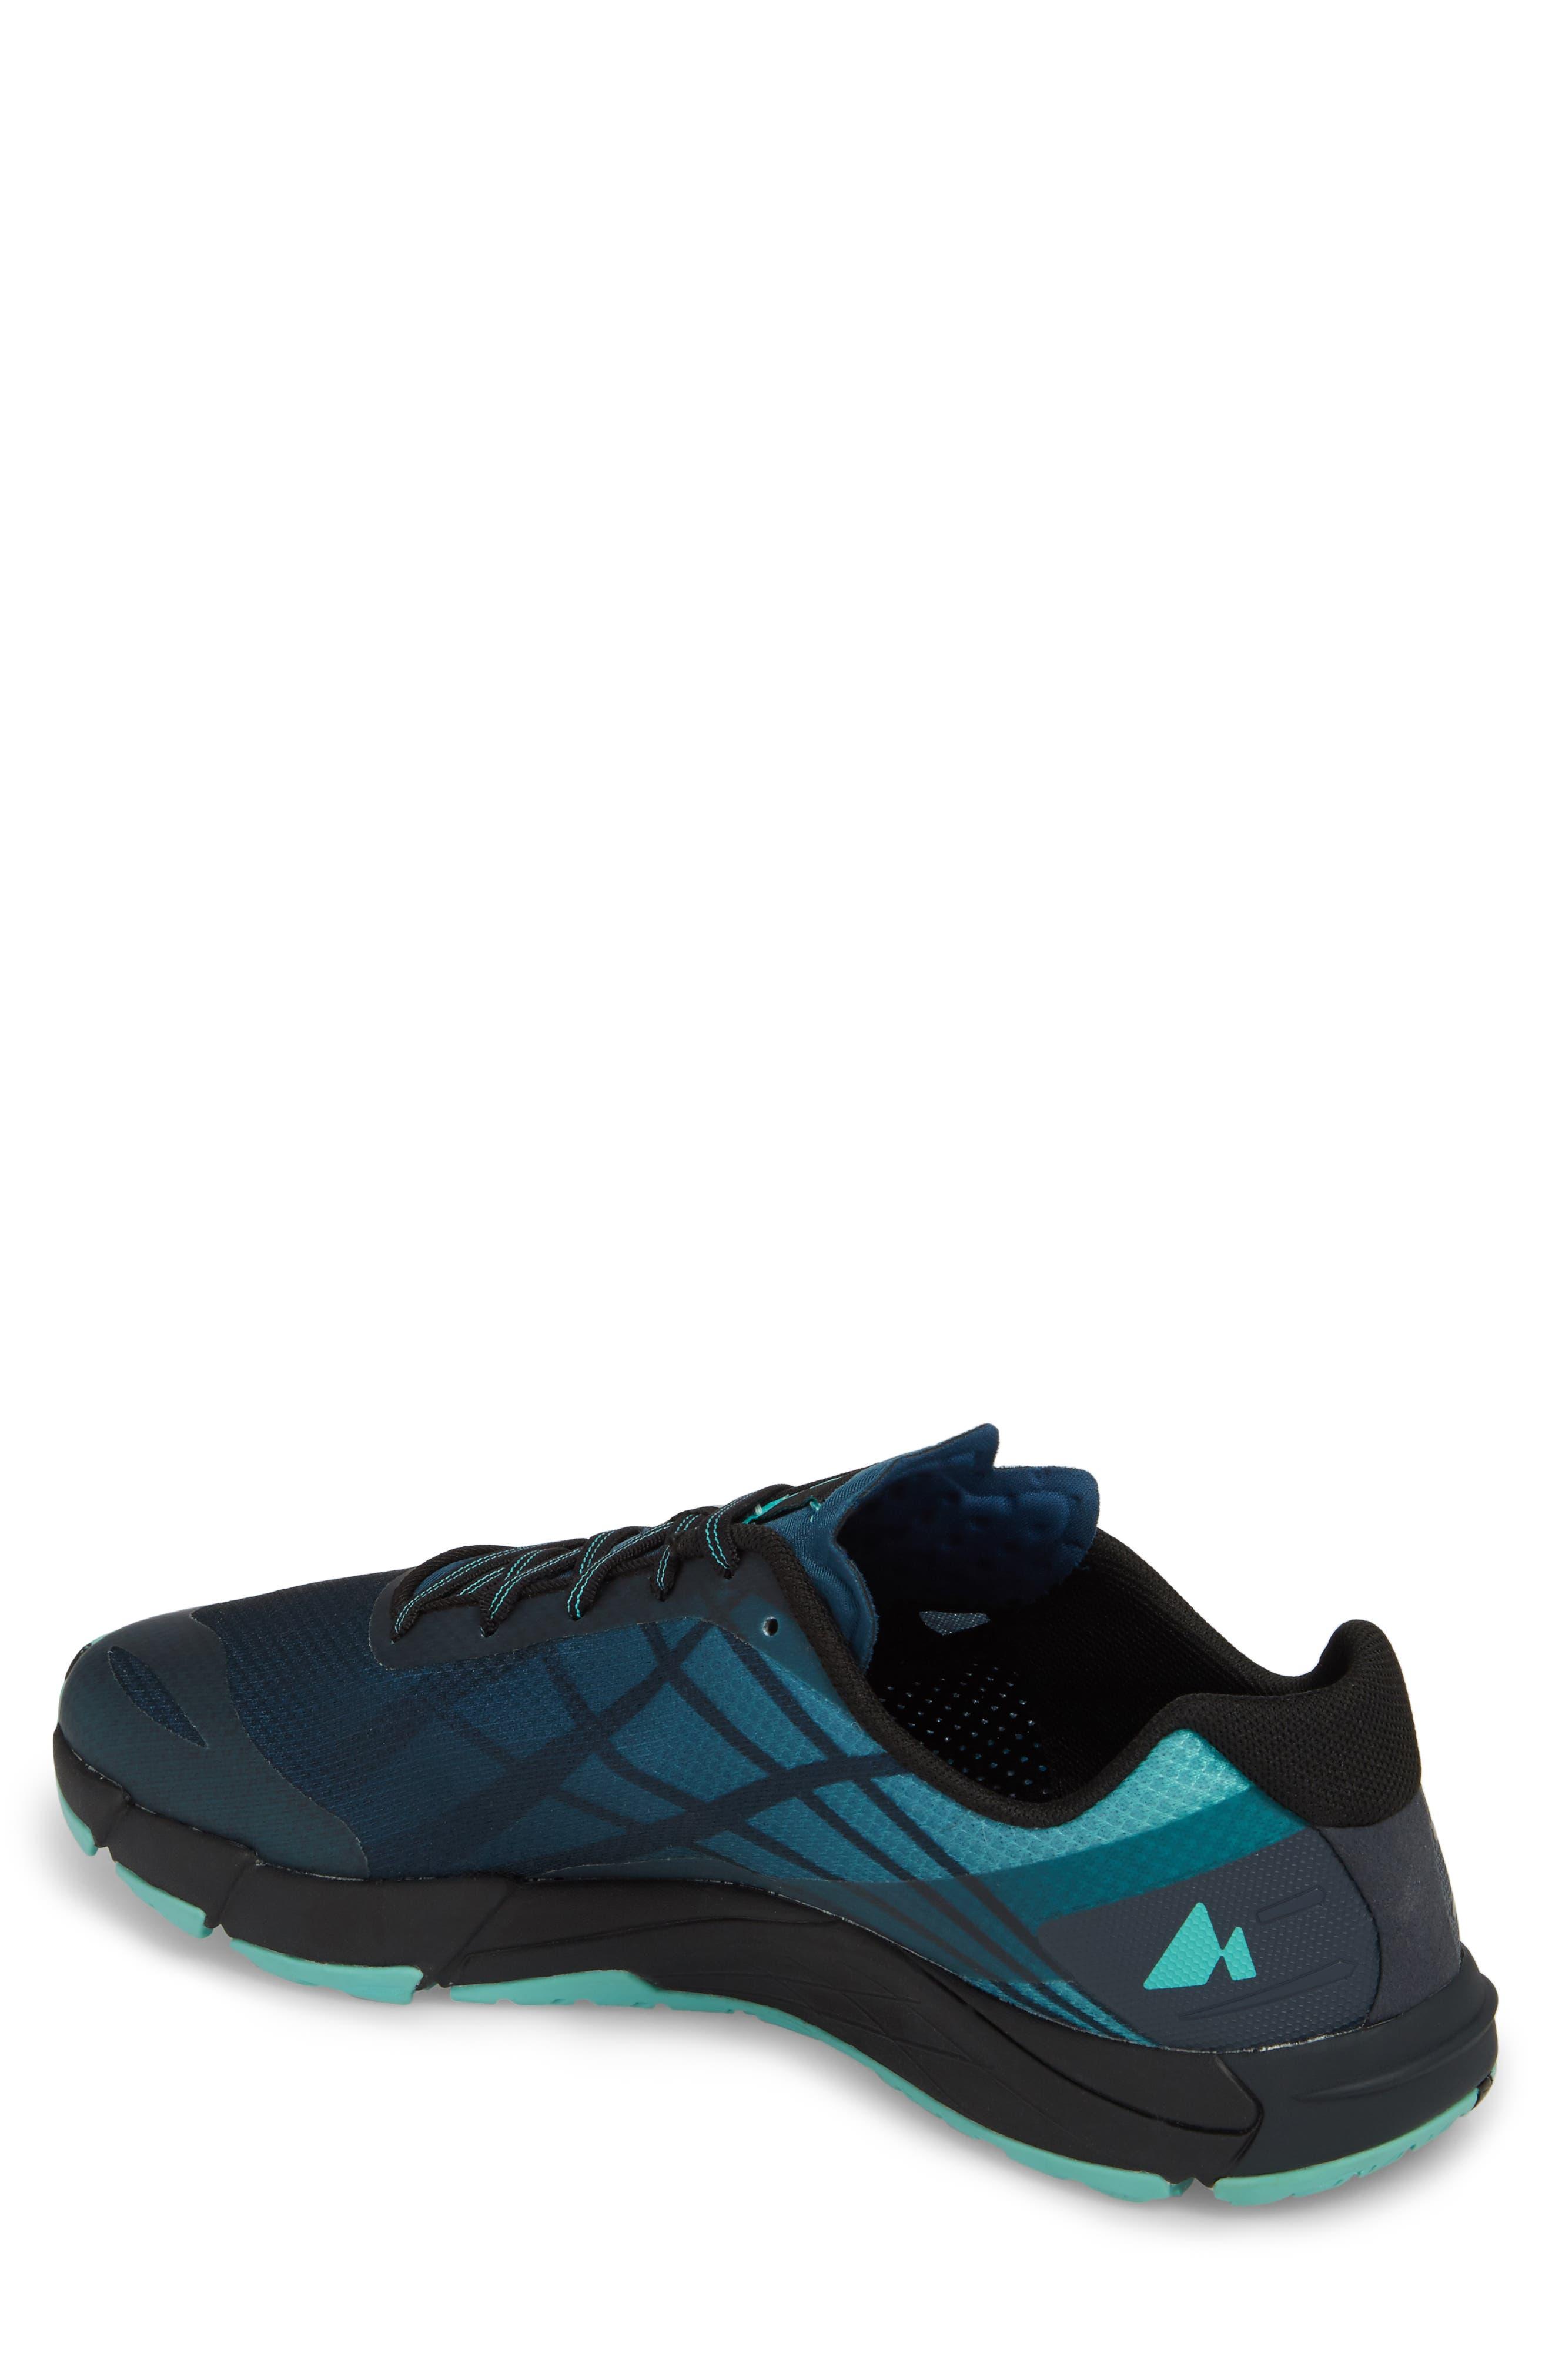 Bare Access Flex Running Shoe,                             Alternate thumbnail 2, color,                             Legion Blue